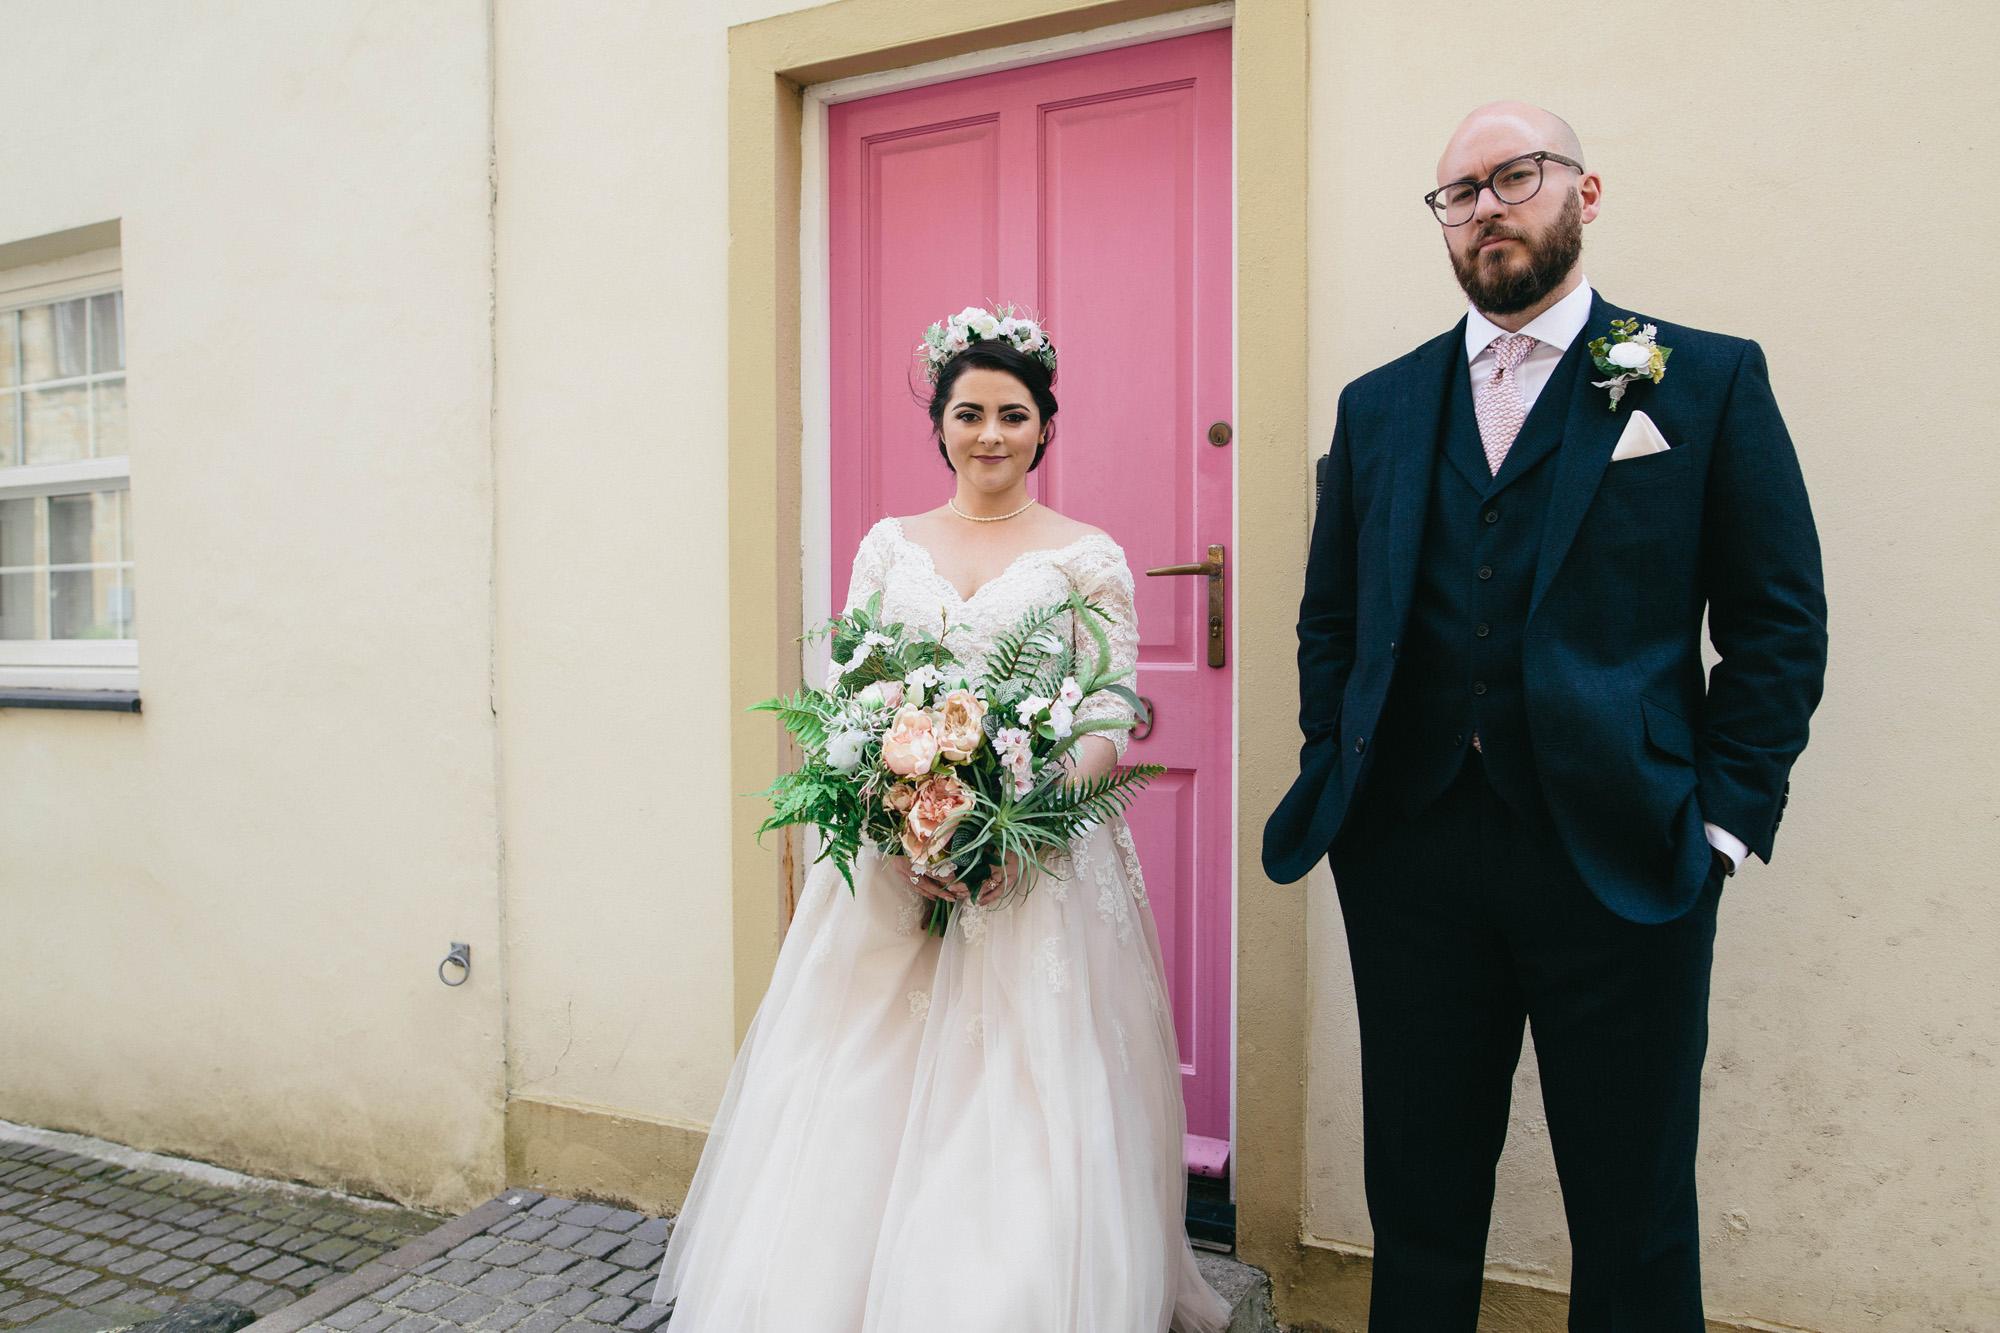 Quirky Wedding Photography Glasgow West End 035.jpg